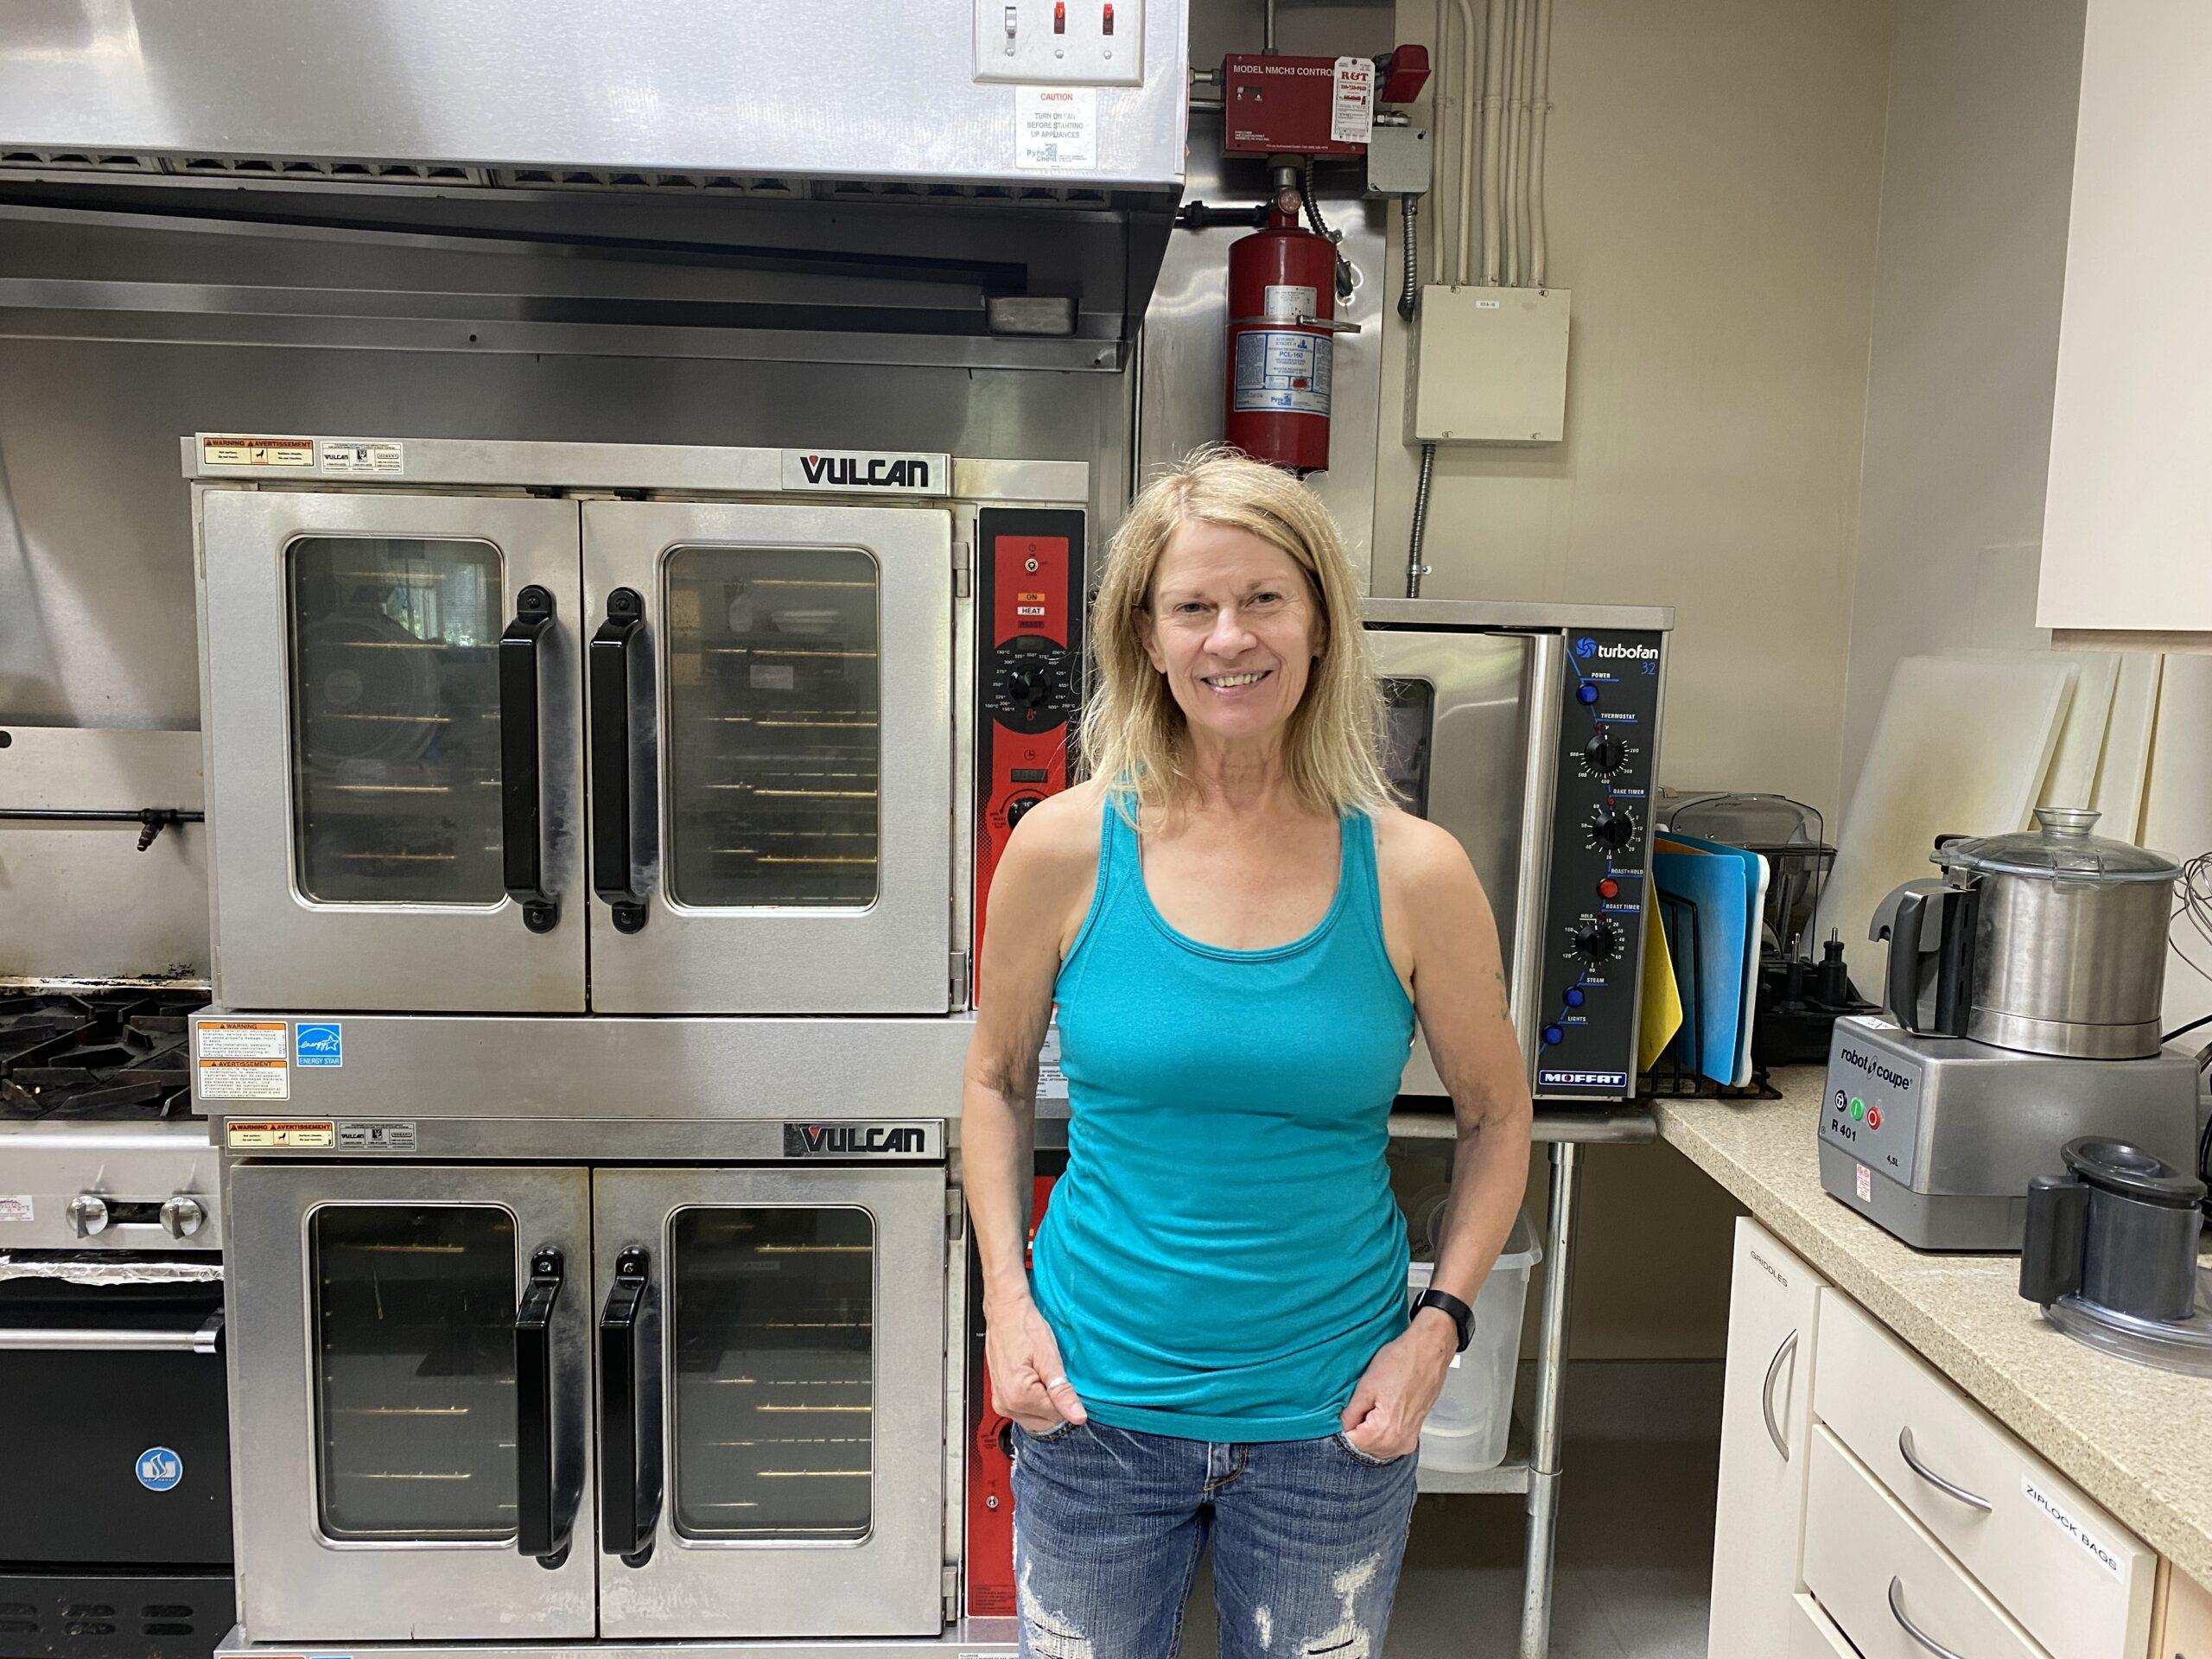 (Re)Introducing the Volunteer Spotlight: Meet Cathy